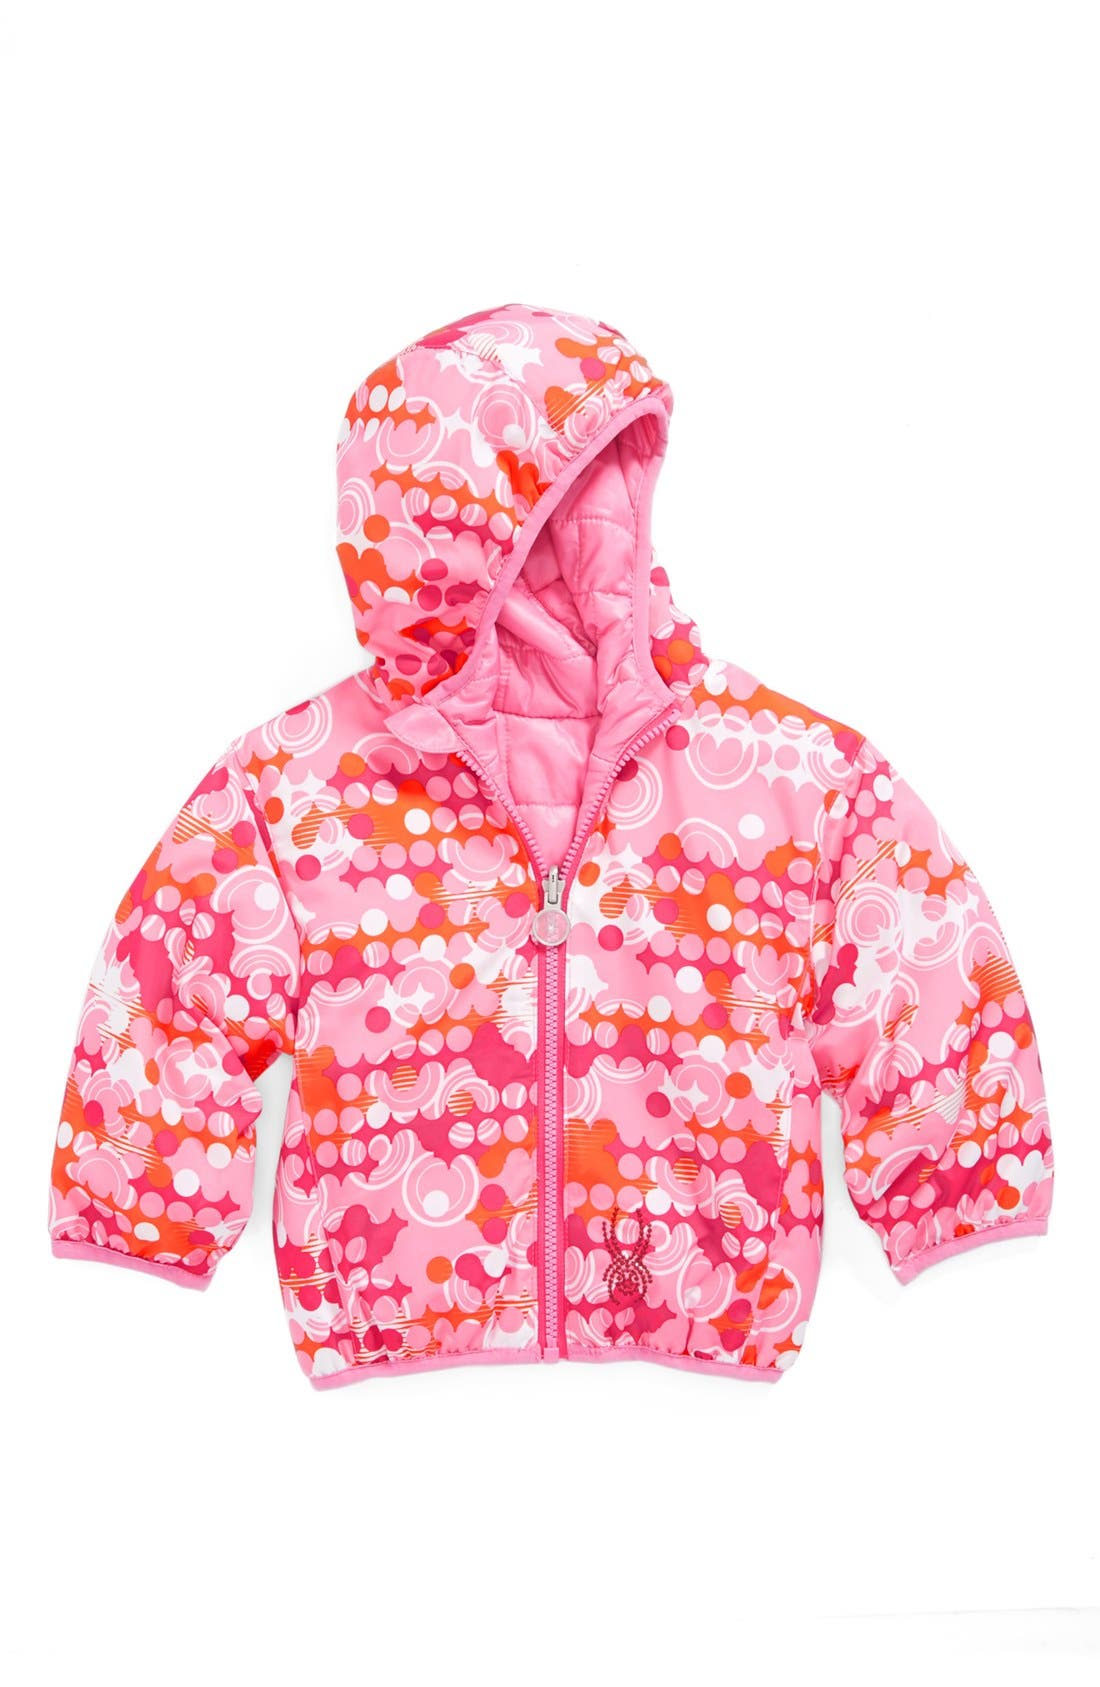 Main Image - Spyder 'Yummy' Reversible Jacket (Baby Girls)